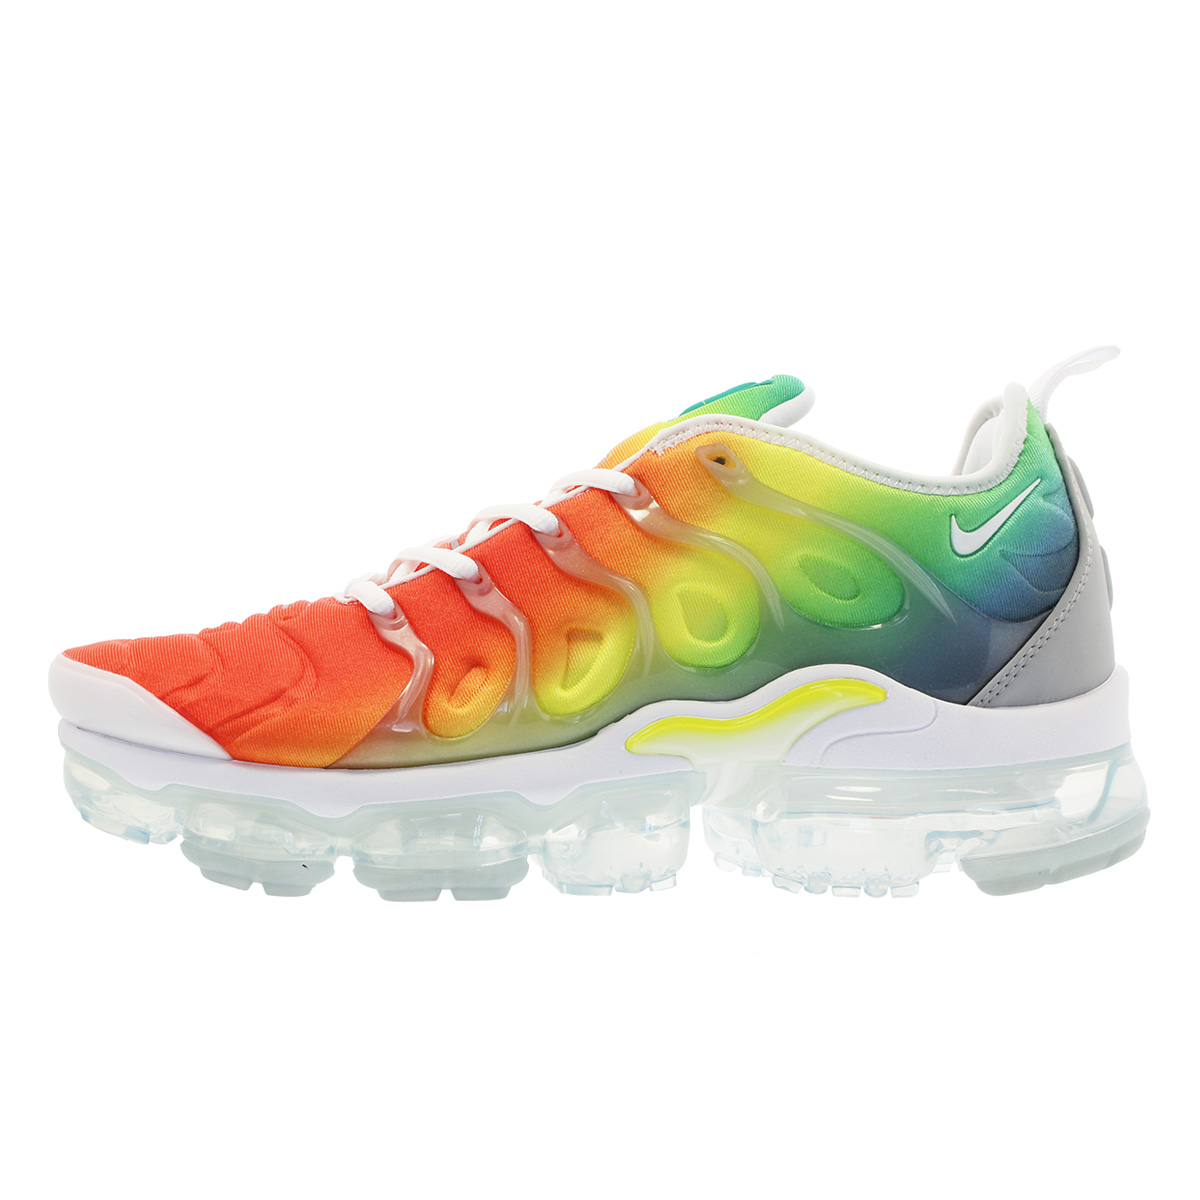 b04d116dcbc NIKE AIR VAPORMAX PLUS Nike vapor max plus WHITE NEPTUNE GREEN DYNAMIC  YELLOW 924